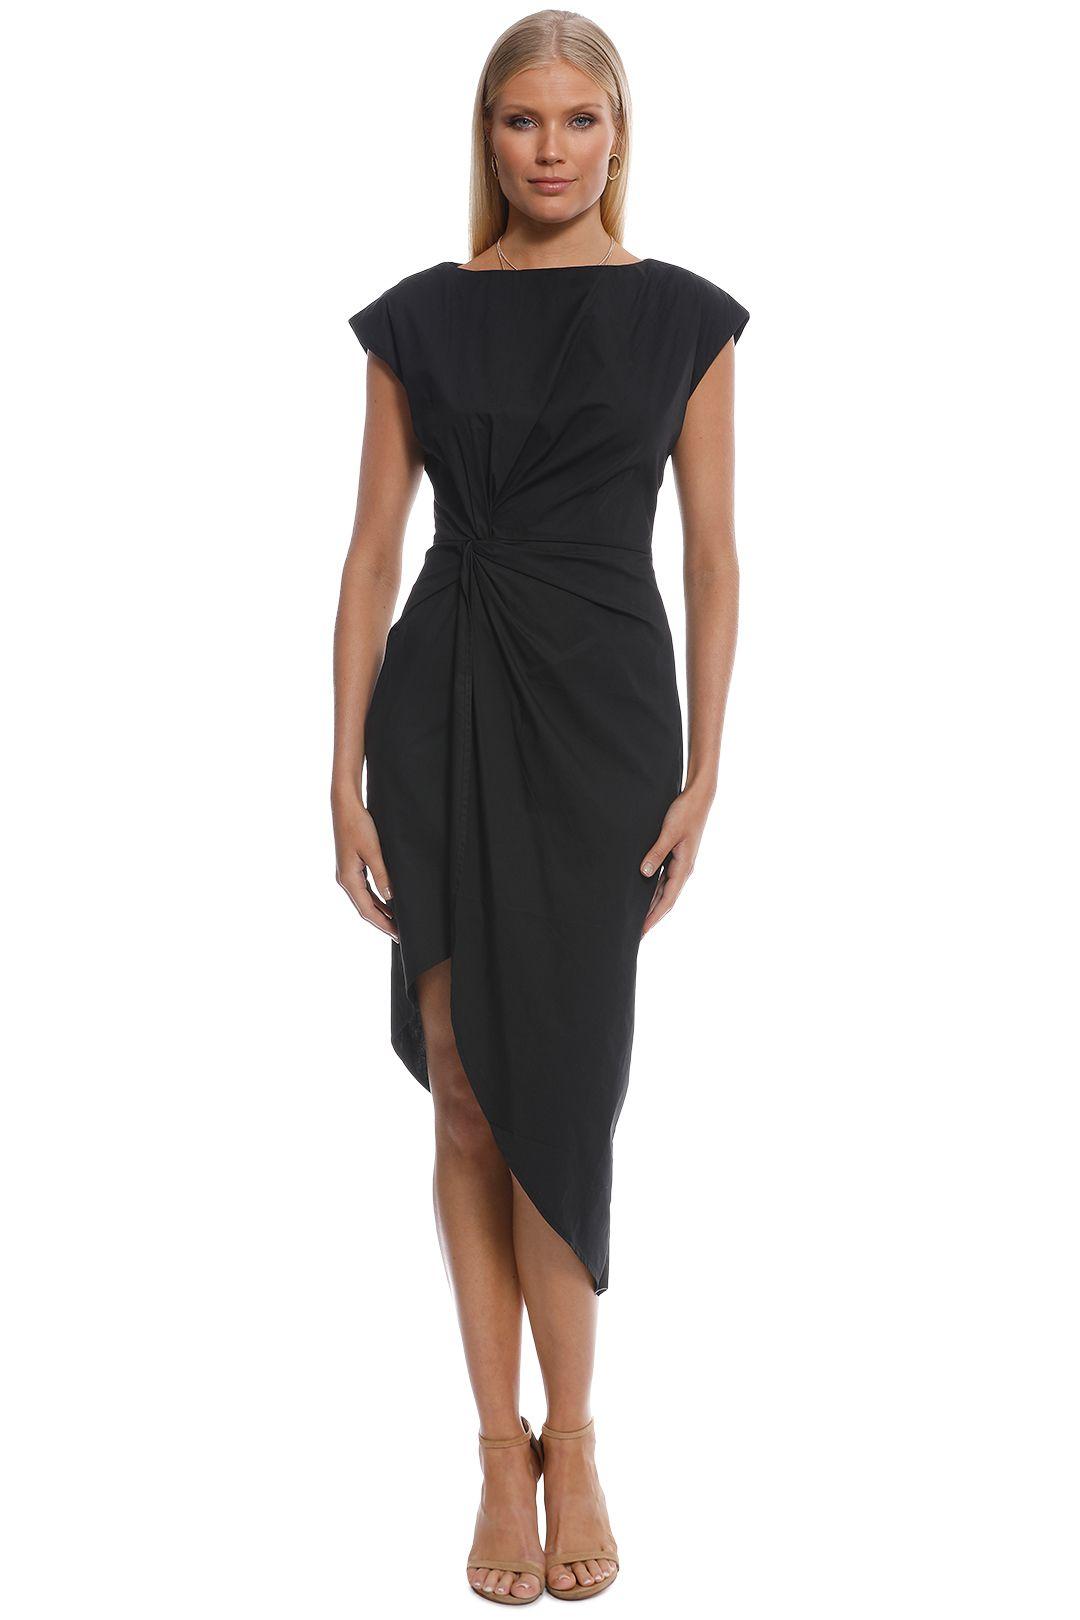 Friend of Audrey - Bailey Twist Midi Dress - Black - Front